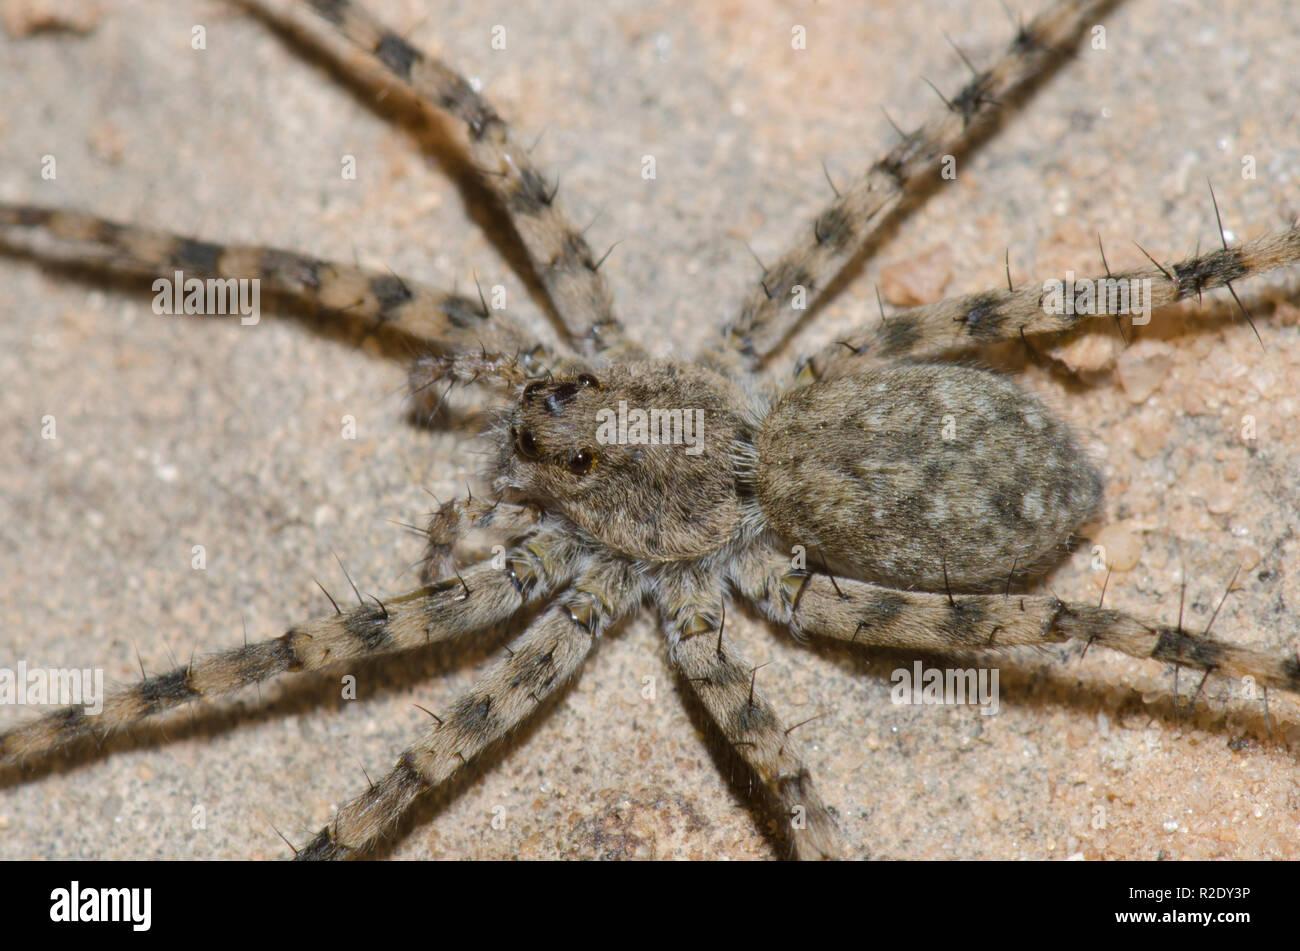 Thinlegged Wolf Spider, Pardosa sp. - Stock Image